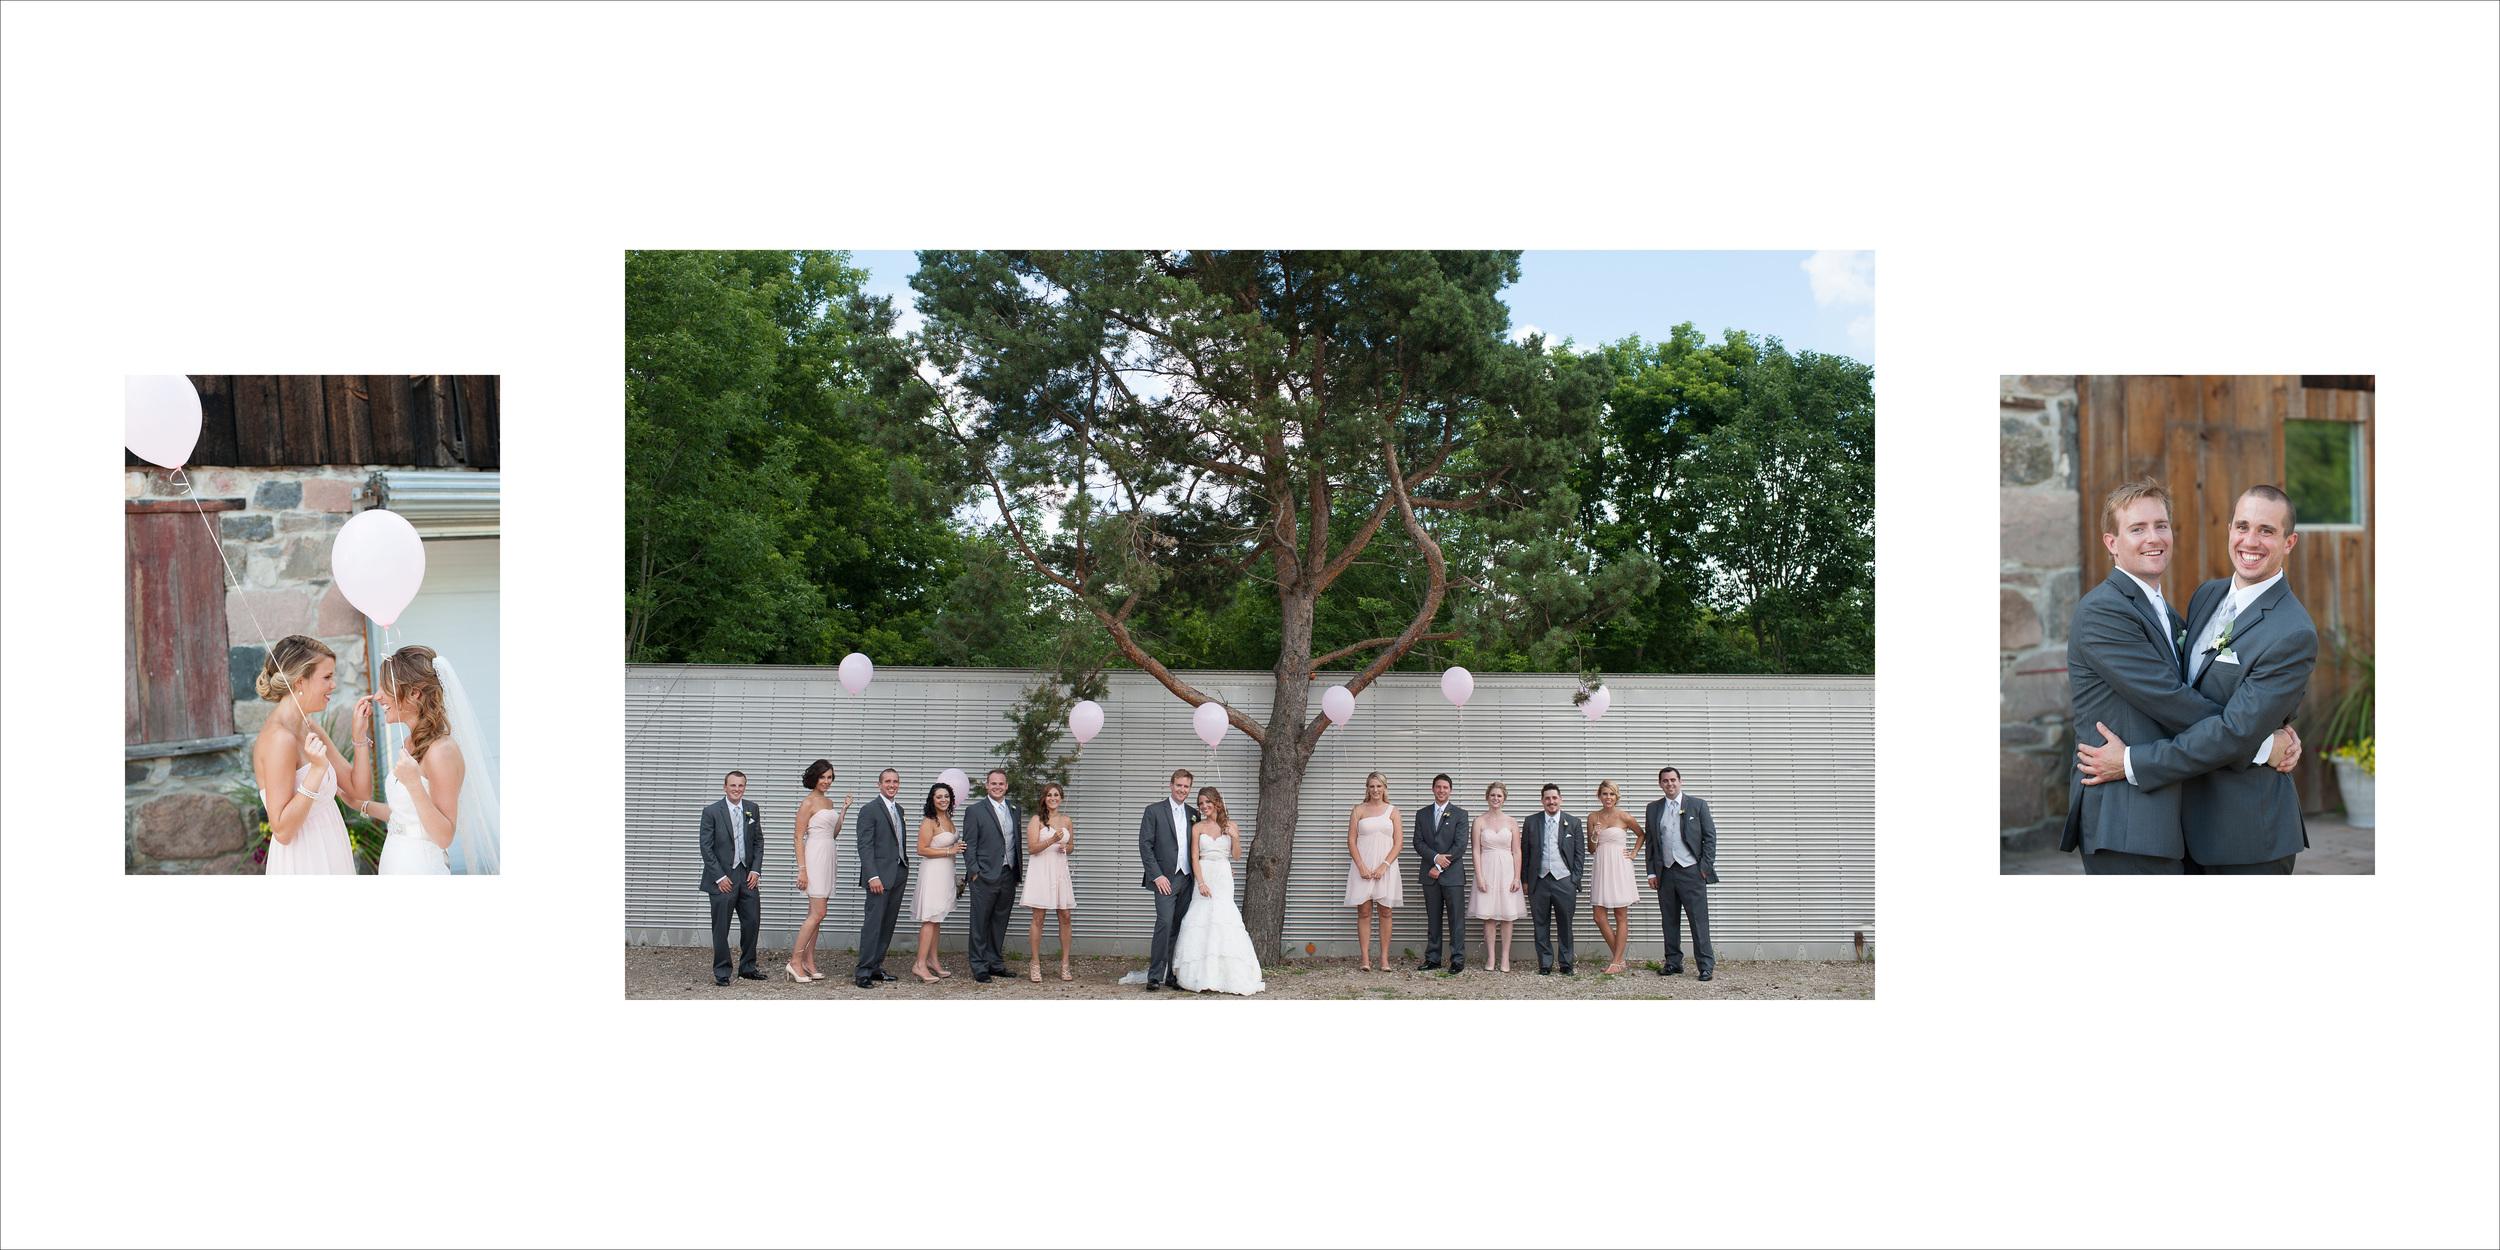 nith-ridge-wedding-album13.jpg